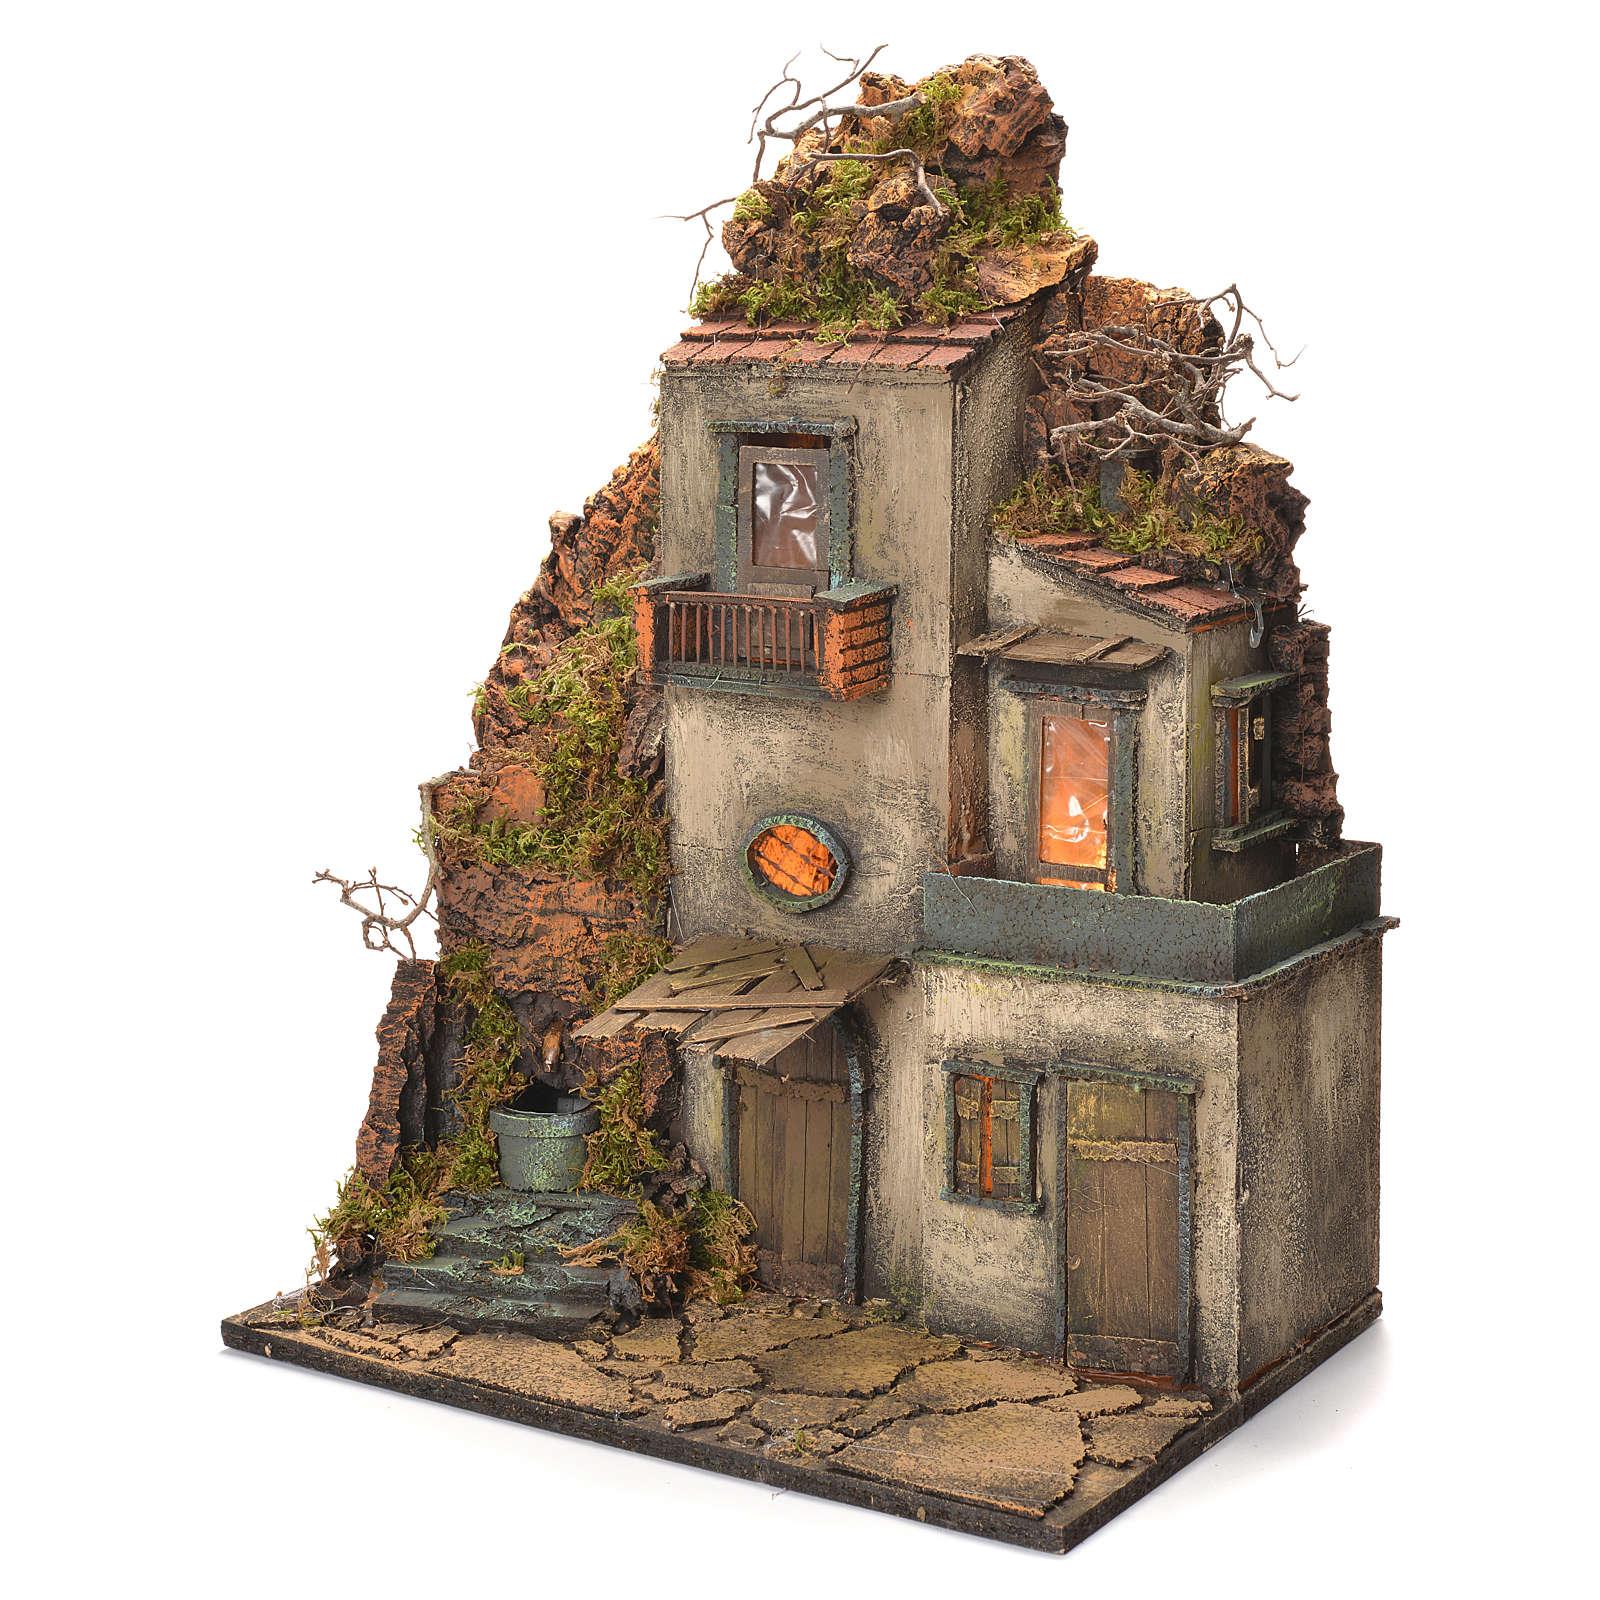 Borgo con fontana e scale presepe napoletano 60x40x30 | eBay